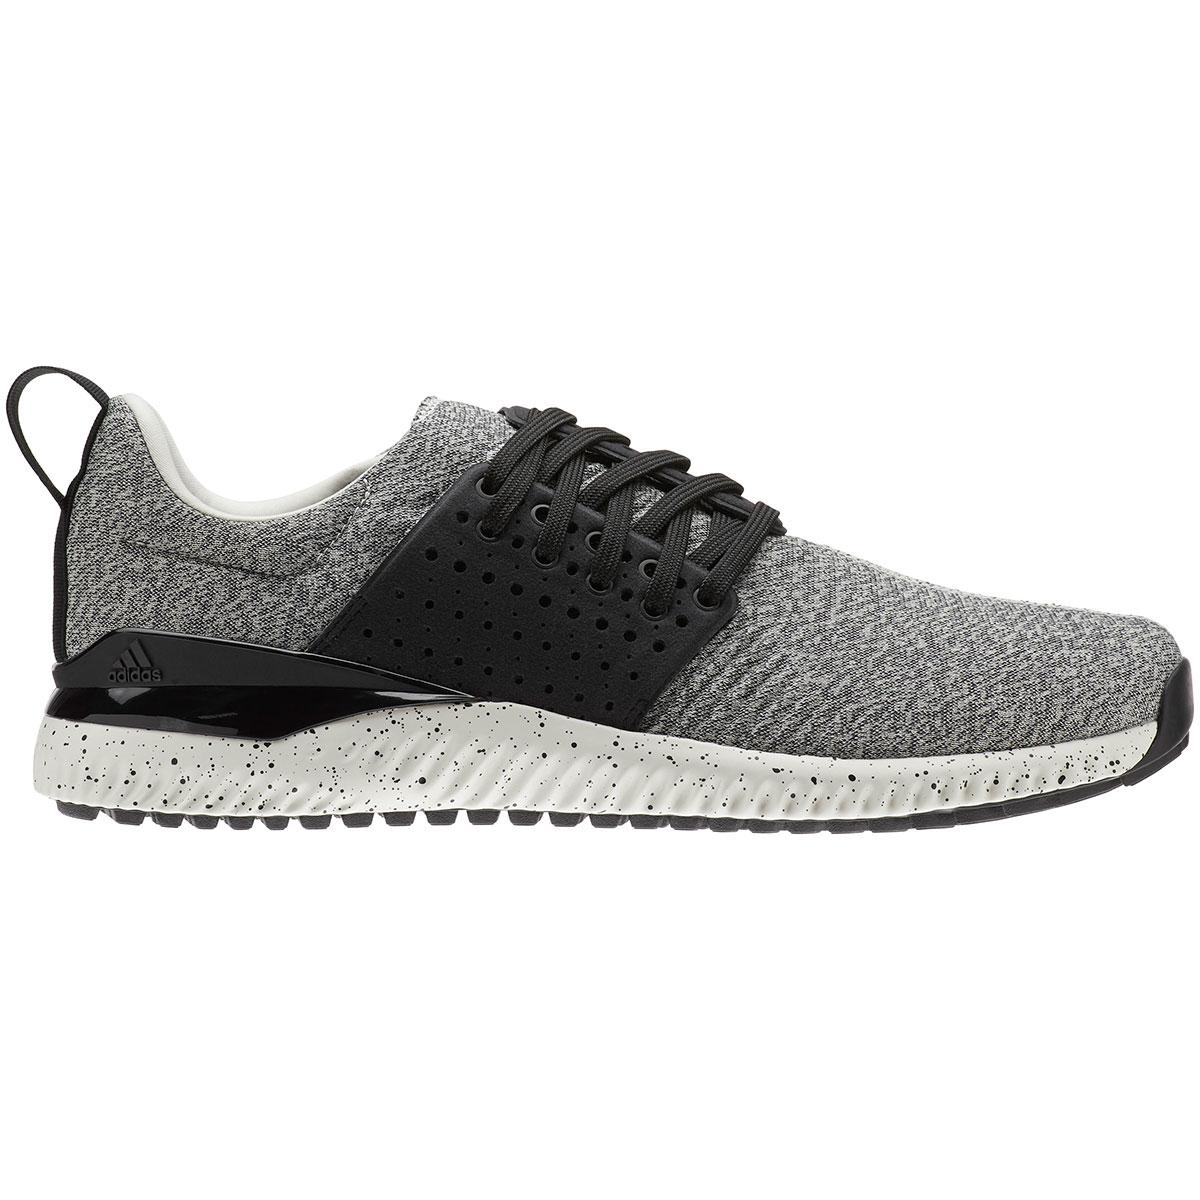 Adidas Men's Adicross Bounce Grey Golf Shoe